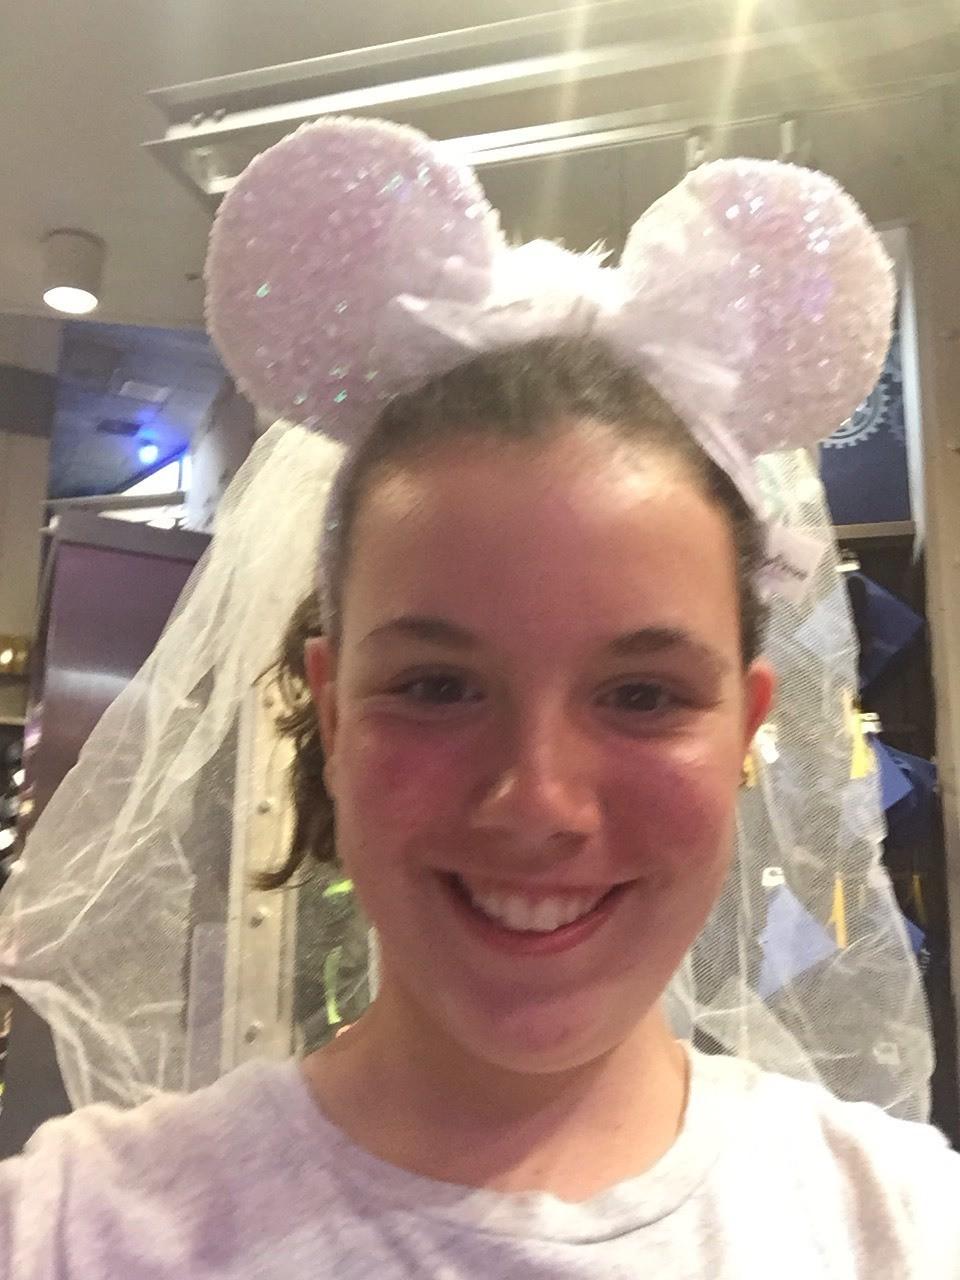 Aly having fun in the Disney hat store